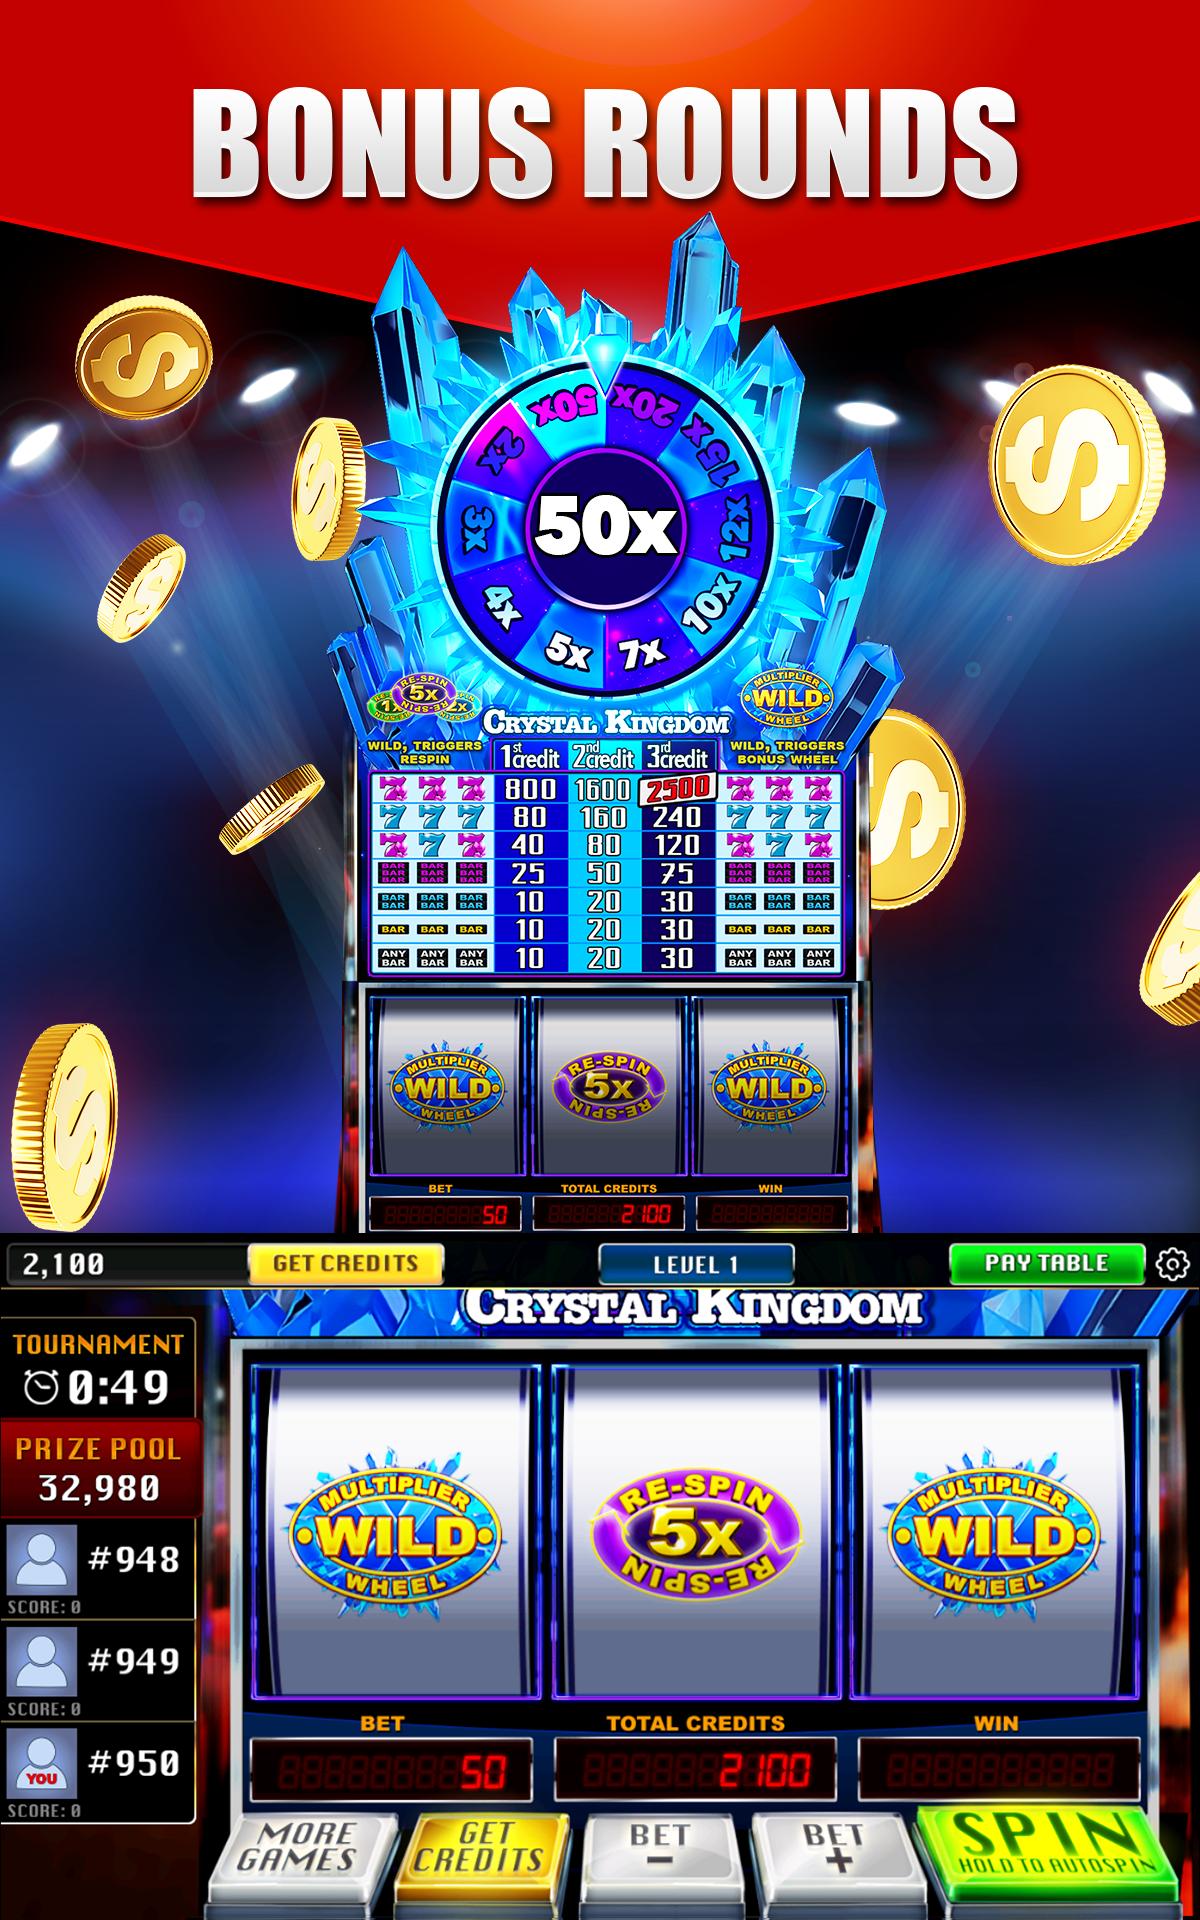 Slots of Vegas casinos en red gratis 304262